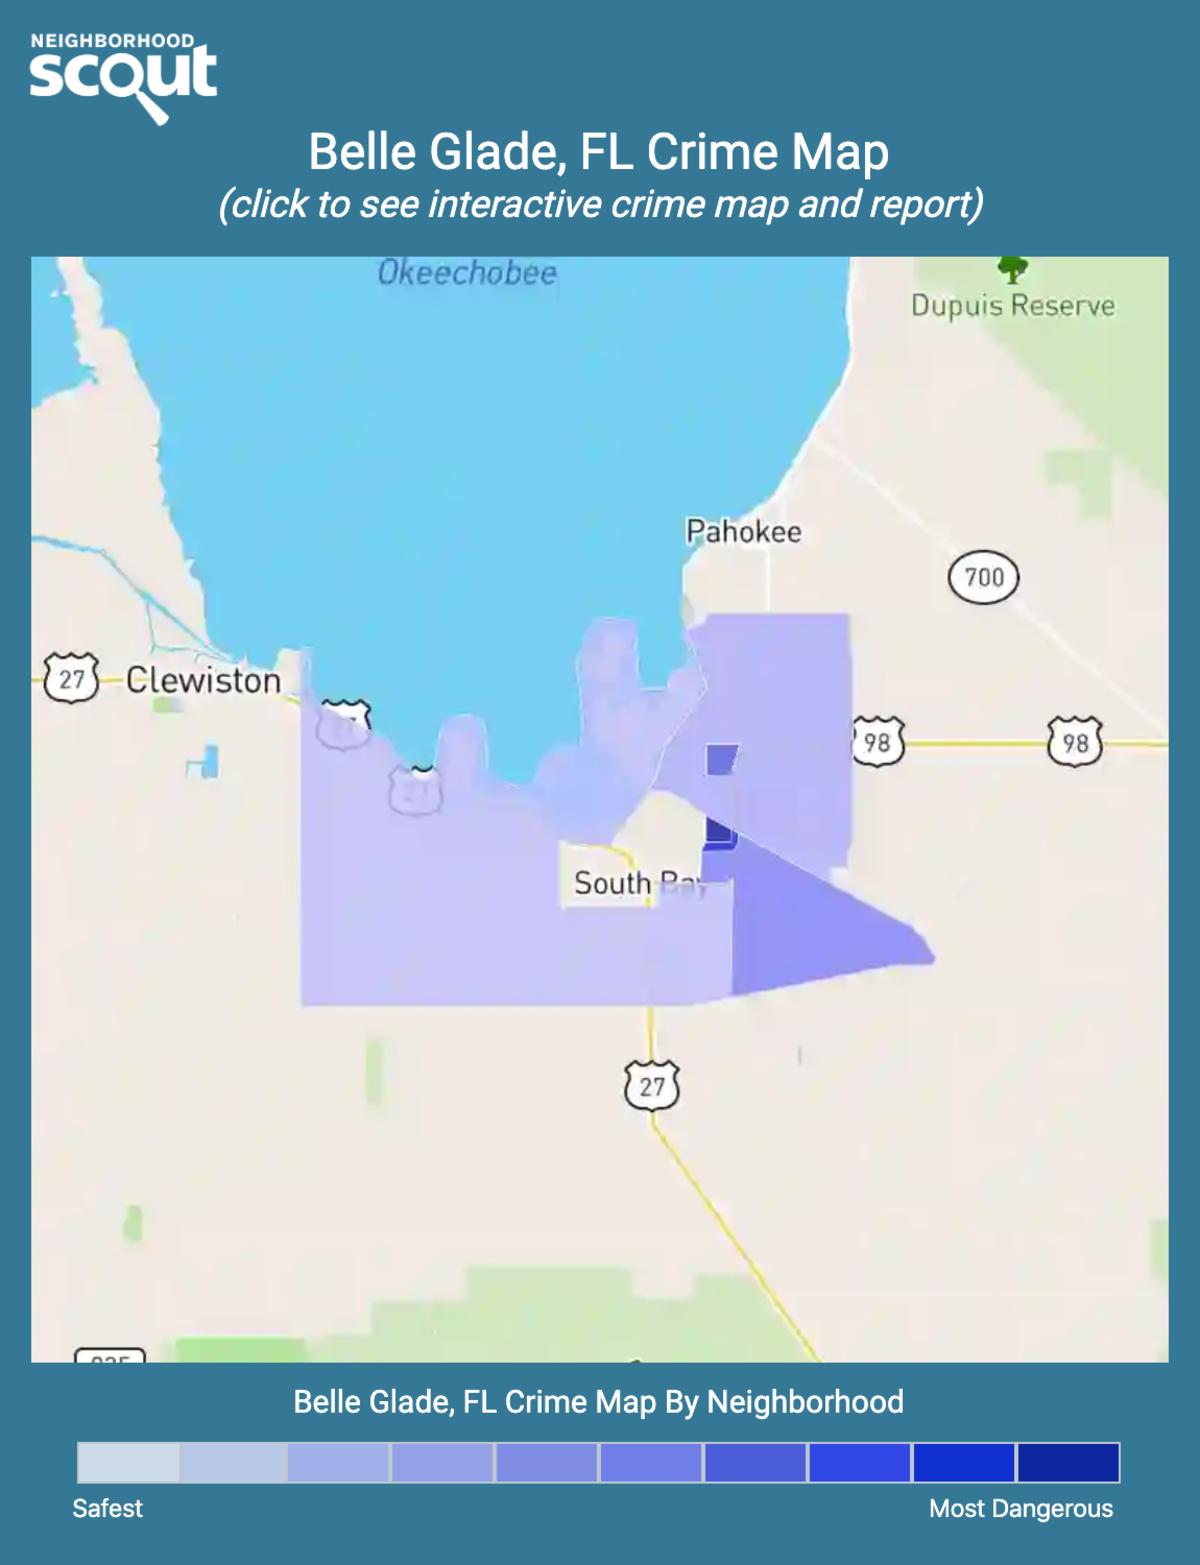 Belle Glade, Florida crime map